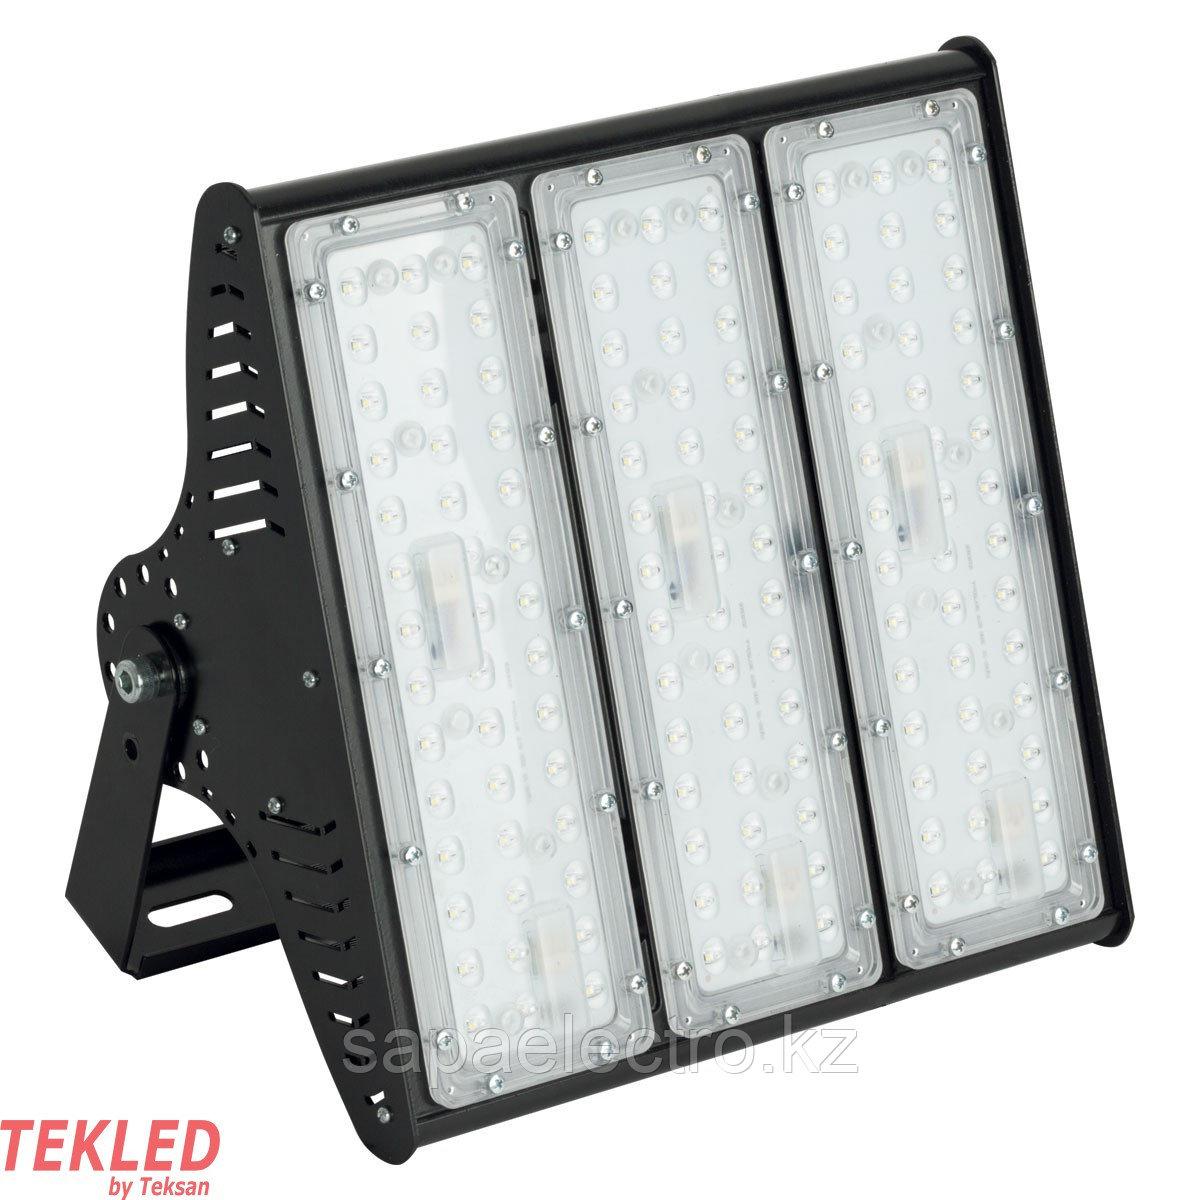 Прожектор LED SMART 3*30W (3 года гарантия) MATT BL